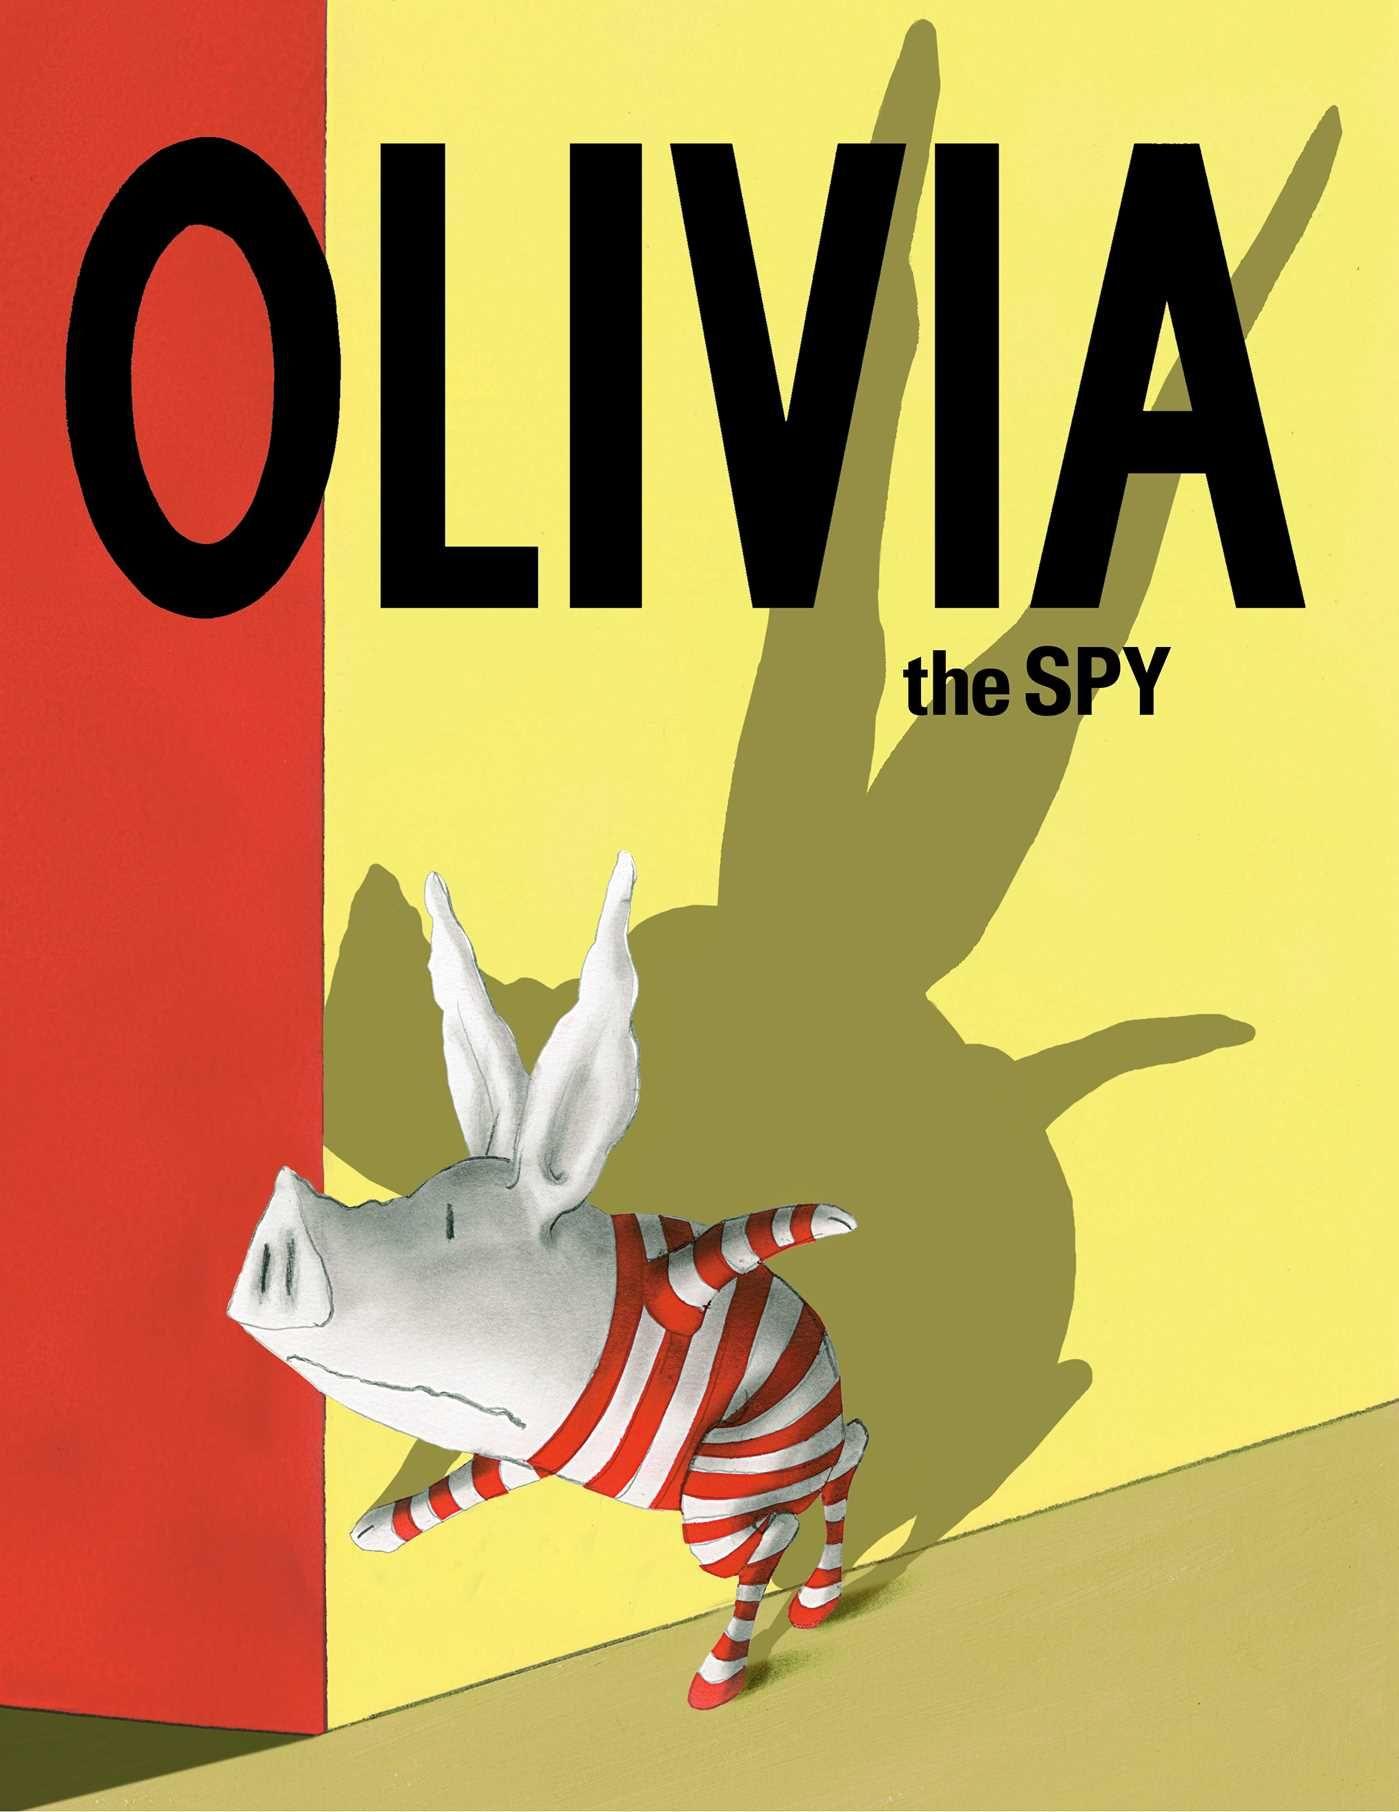 Olivia the Spy   Education   Pinterest